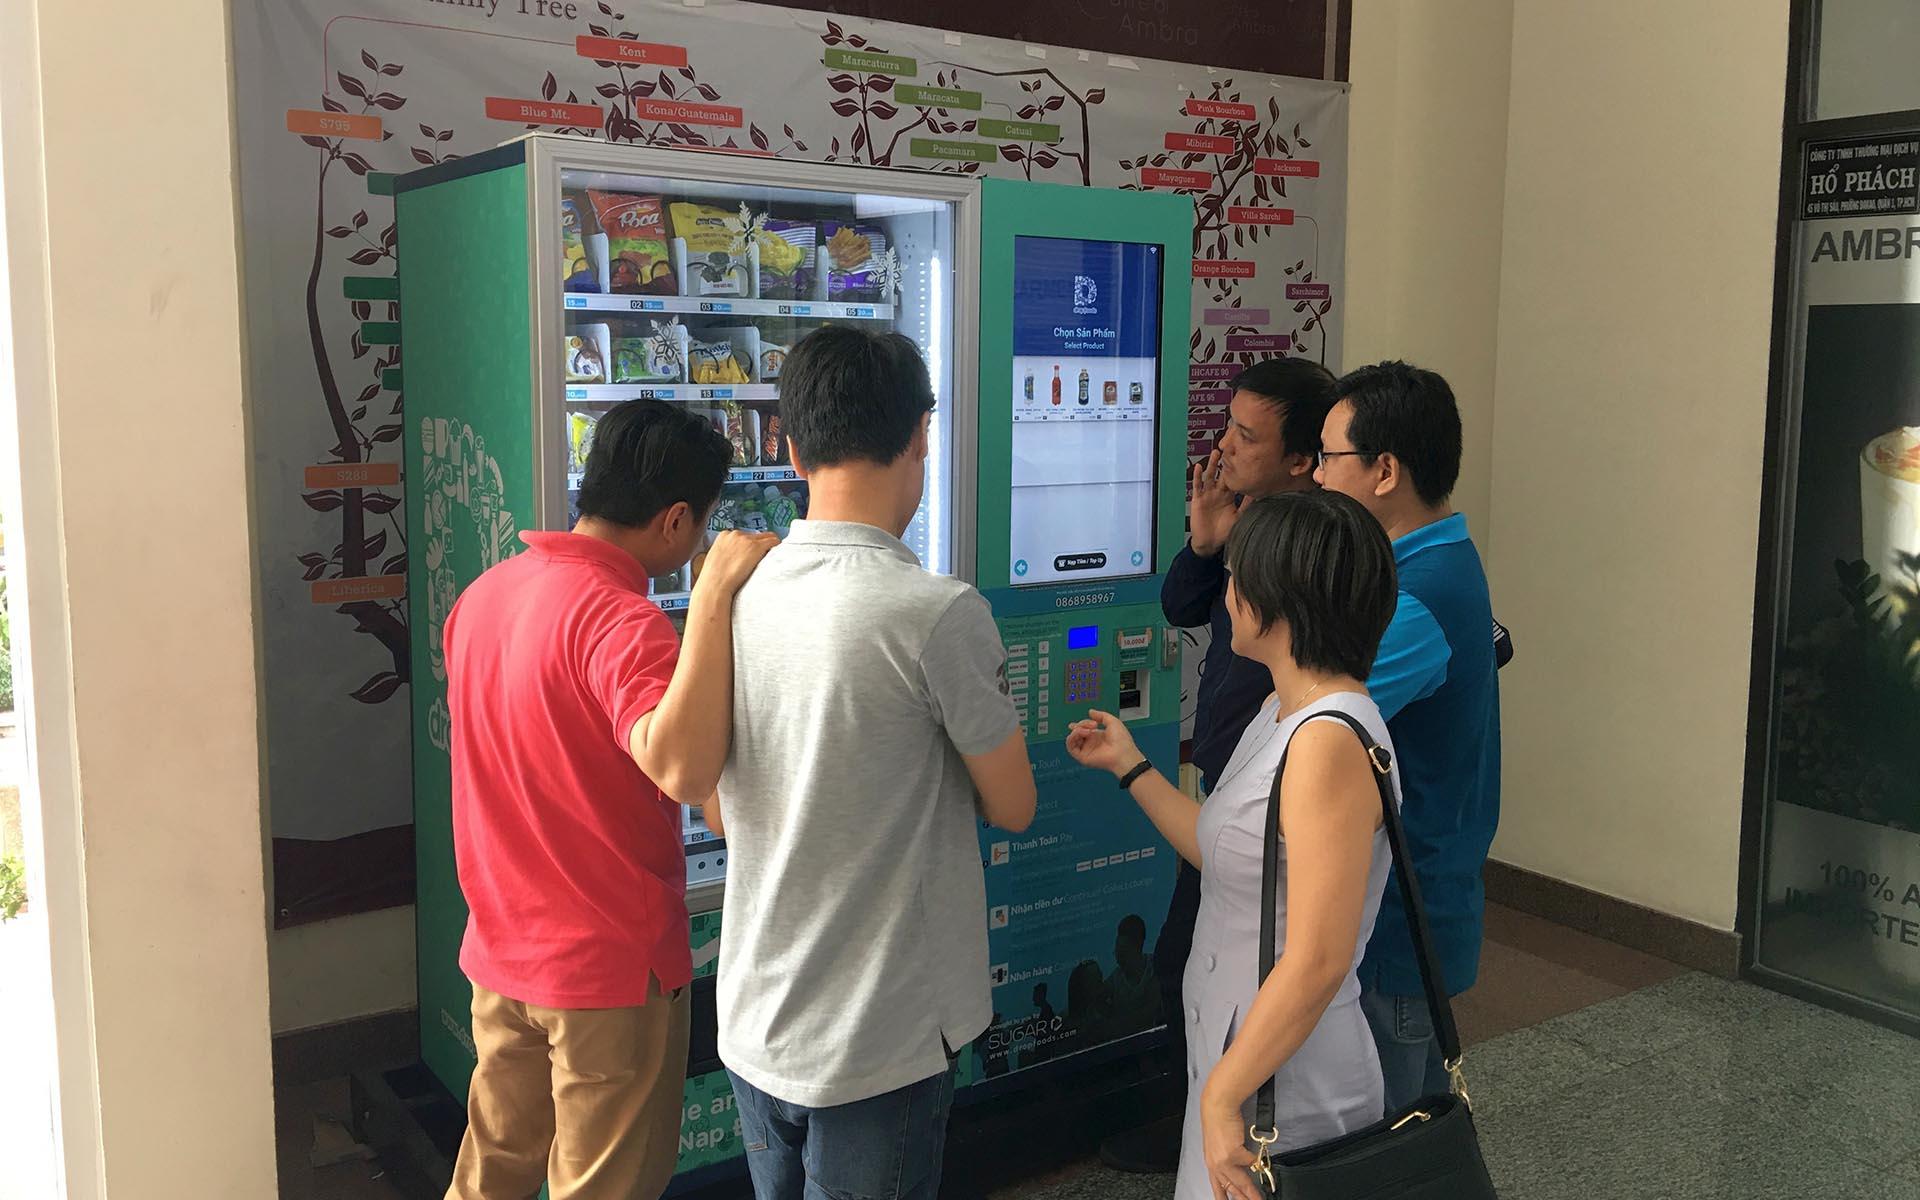 Vietnam's Largest Smart Vending Machine Operator Dropfoods to Raise Funds Through ICO on 21 Sept